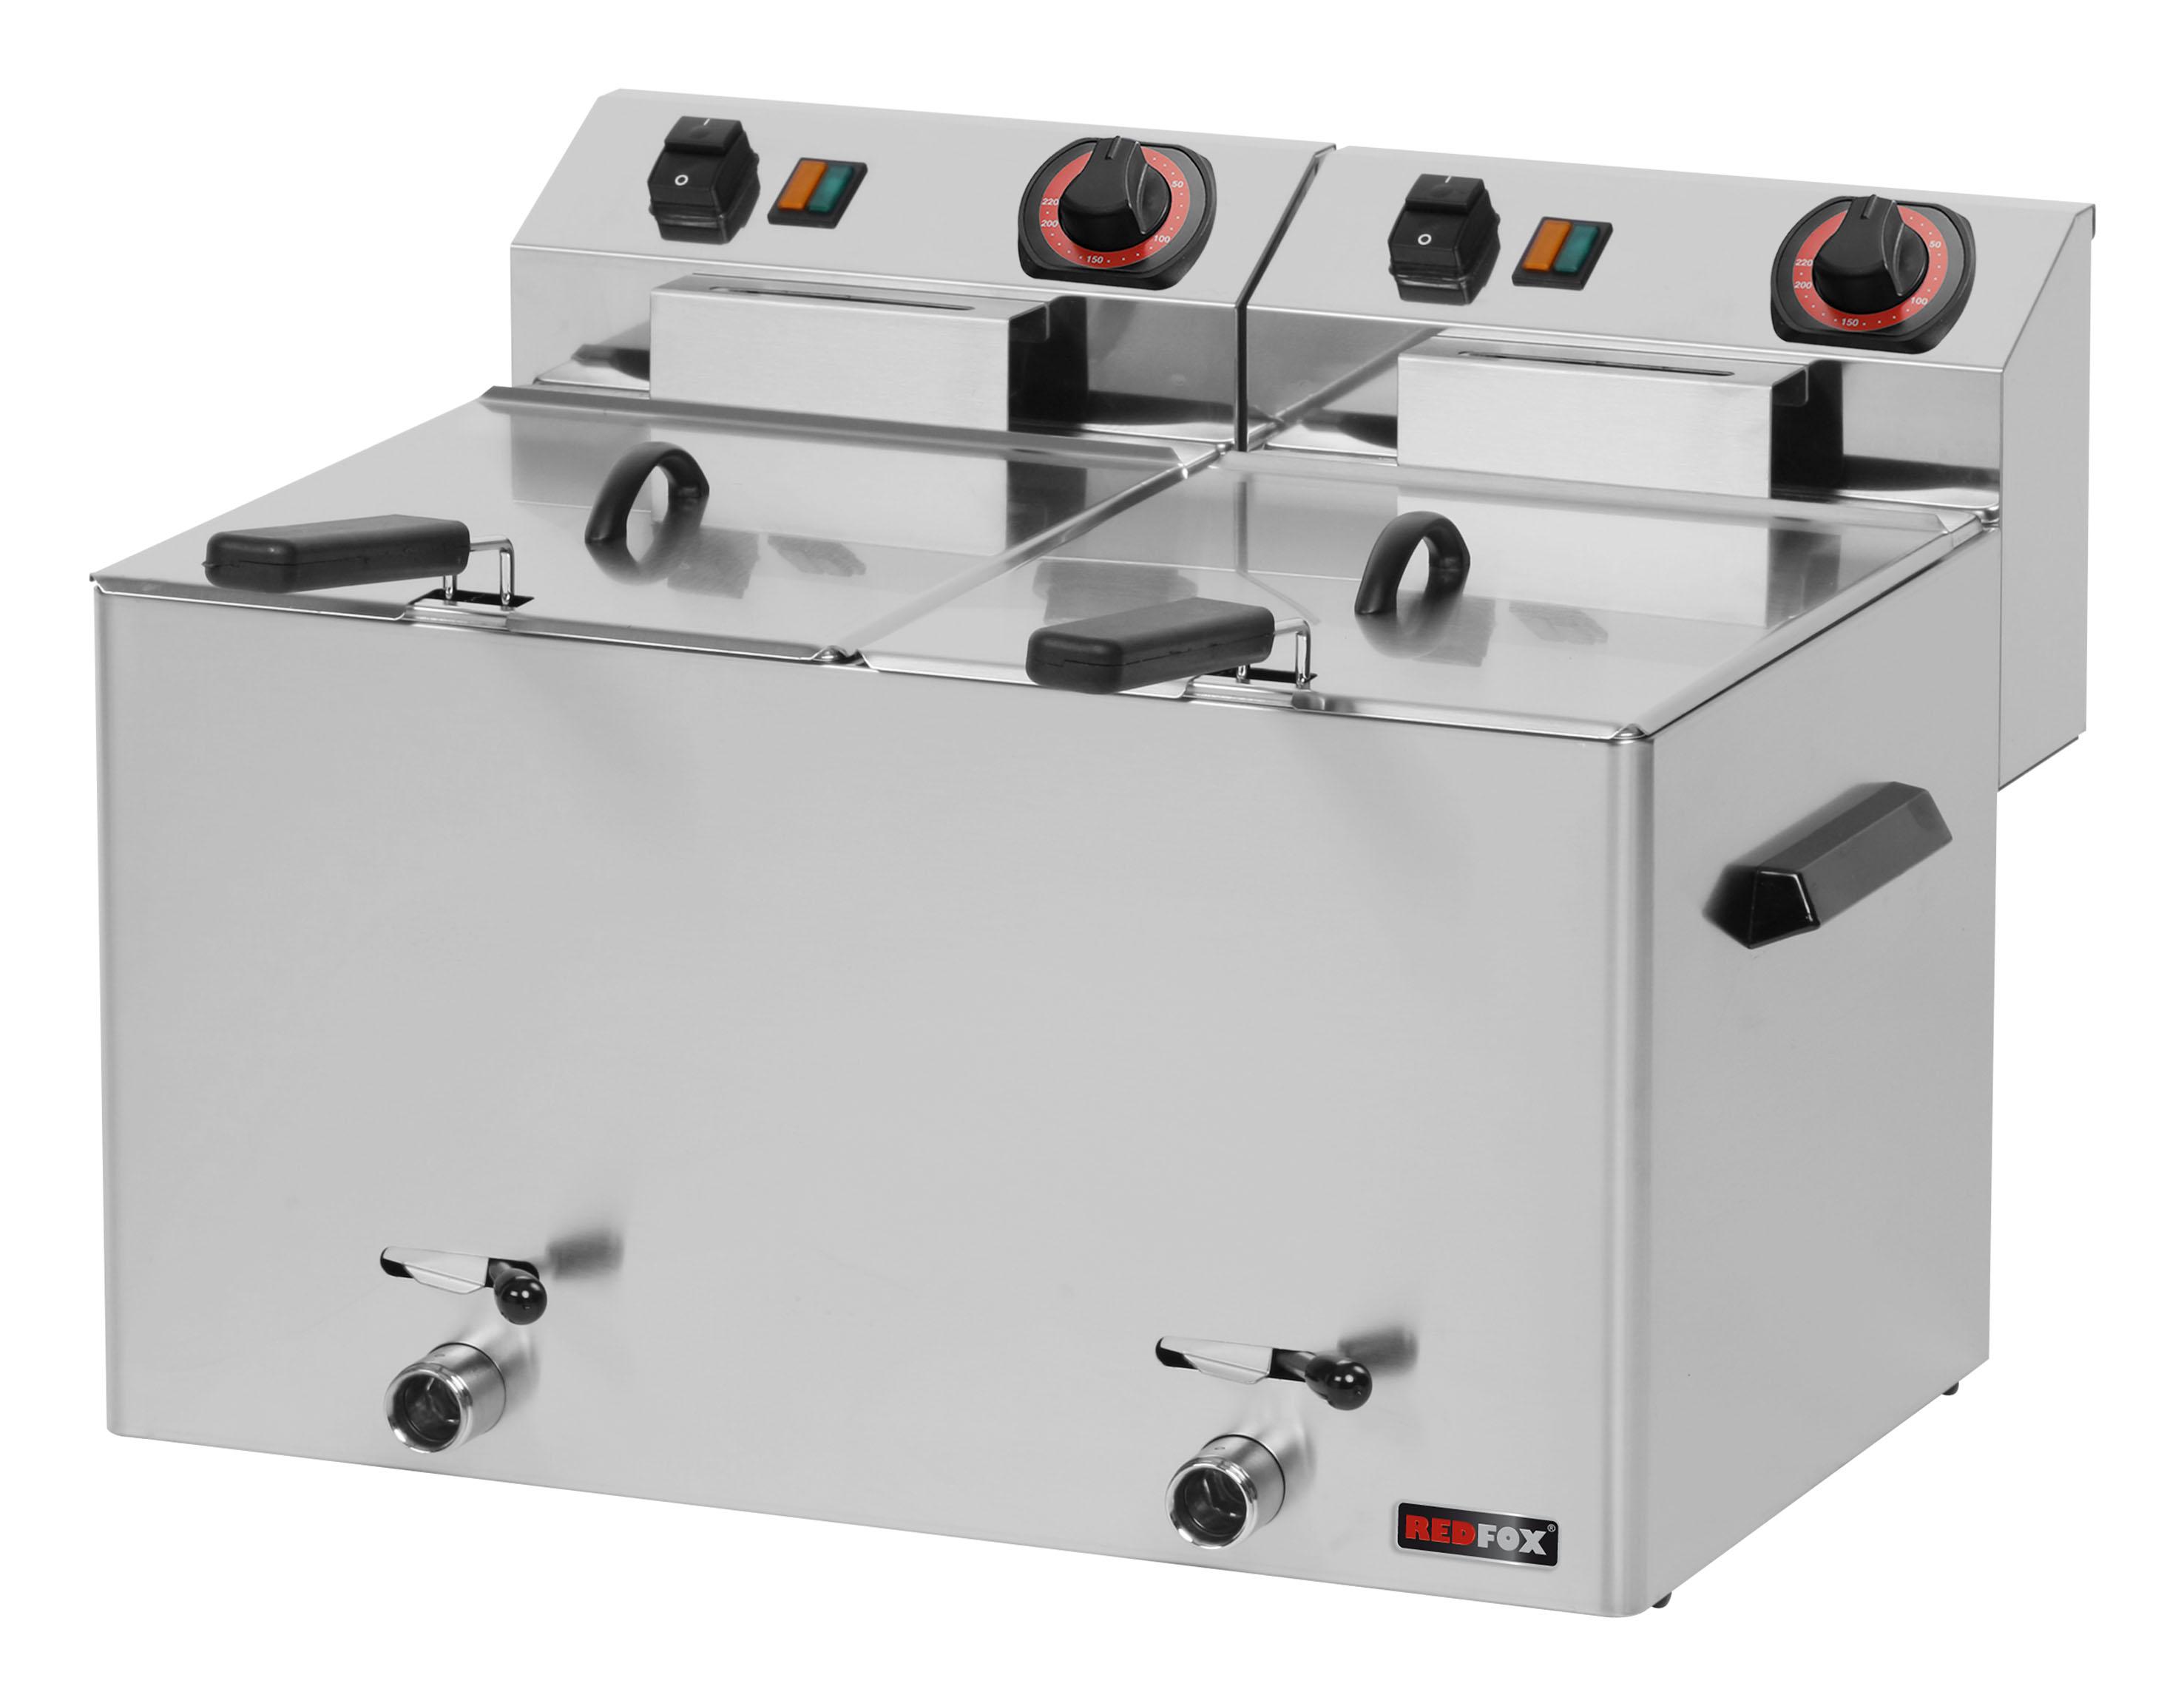 Fritéza elektrická 2x 8 l FE 77 V s výpustí REDFOX